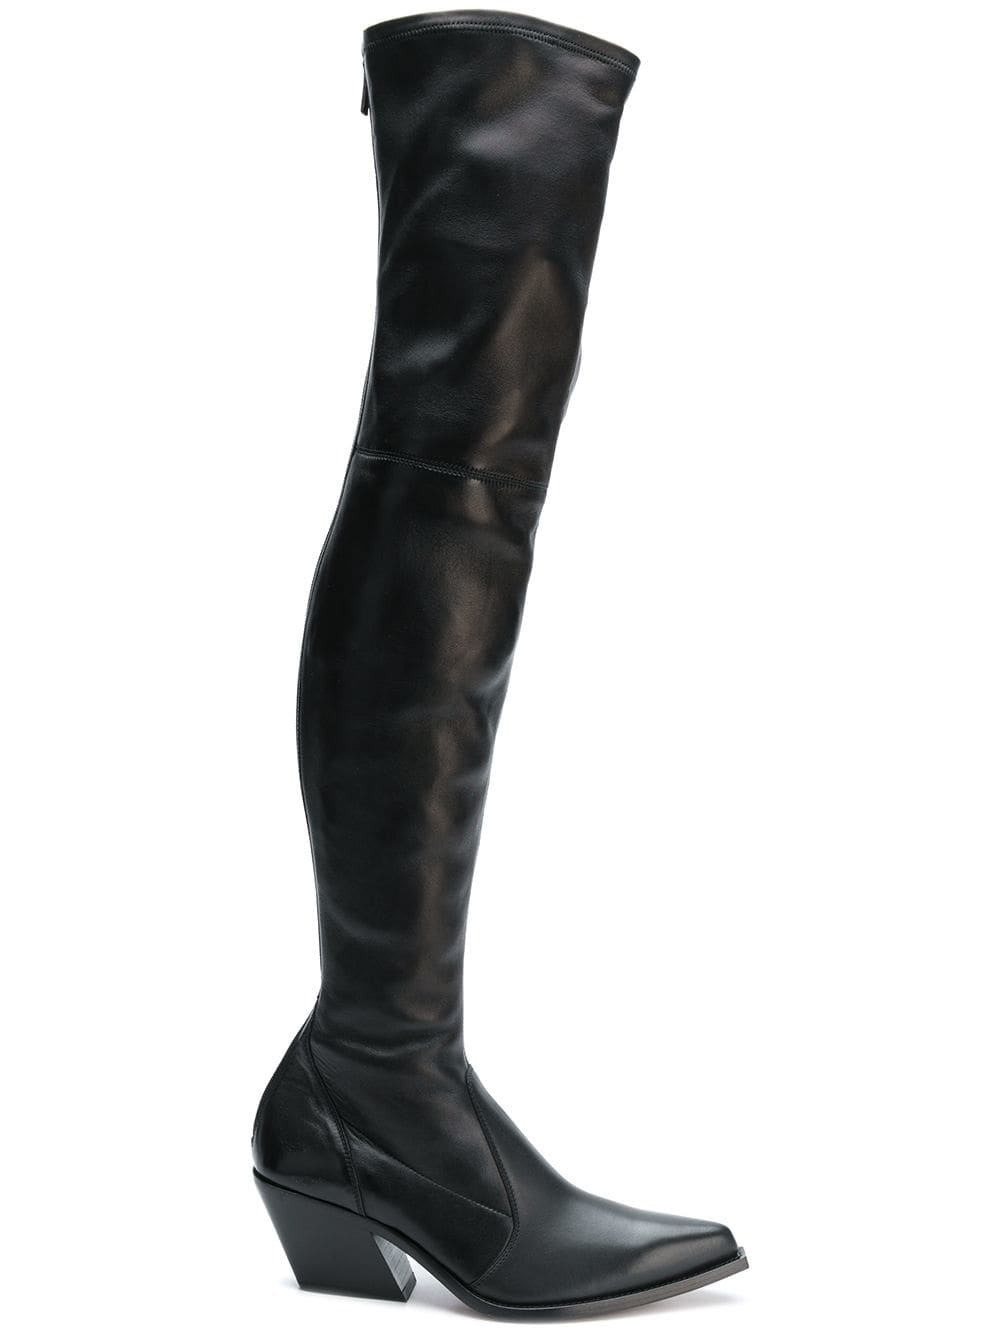 Givenchy Overknee-Stiefel im Cowboy-Look - Schwarz